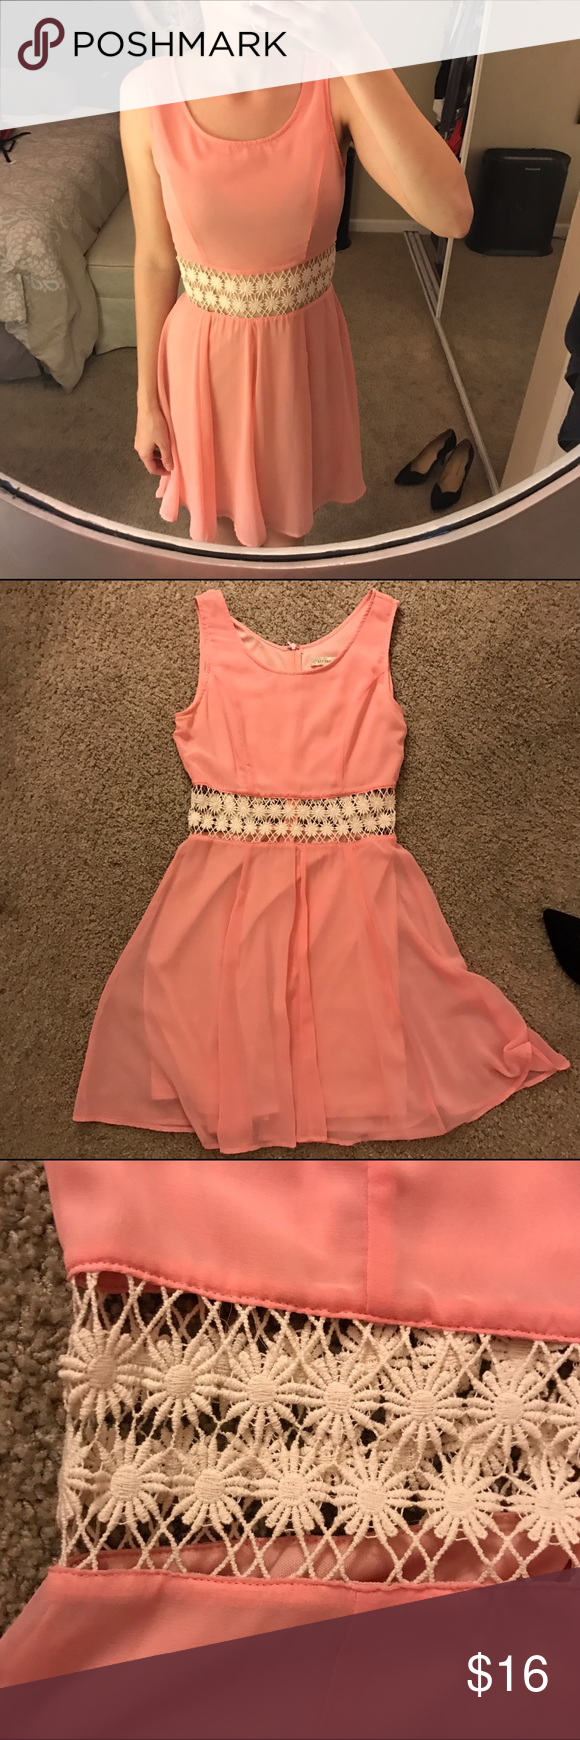 Pink cut out dress  BLACK FRIDAY SALEPink Flowy Flower Cut Out Dress  Knit flowers